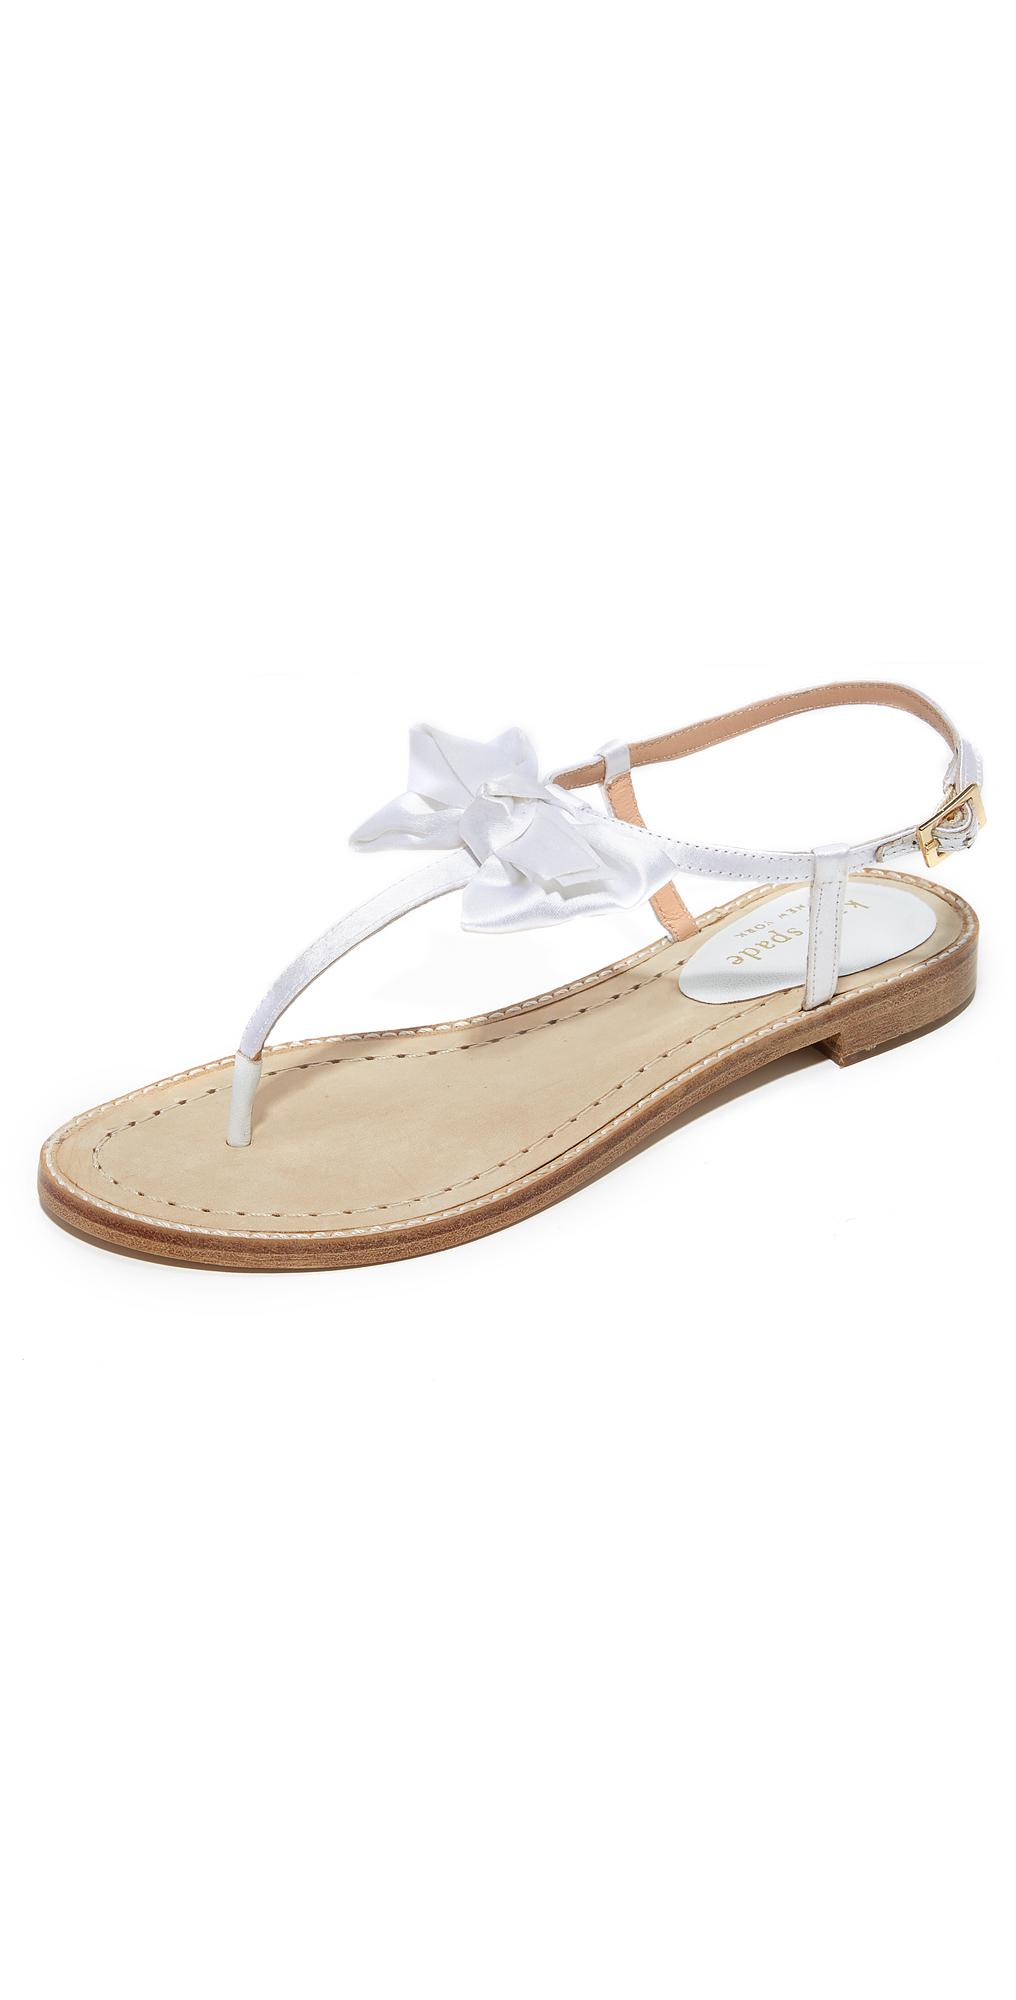 Serrano Bow Sandals Kate Spade New York